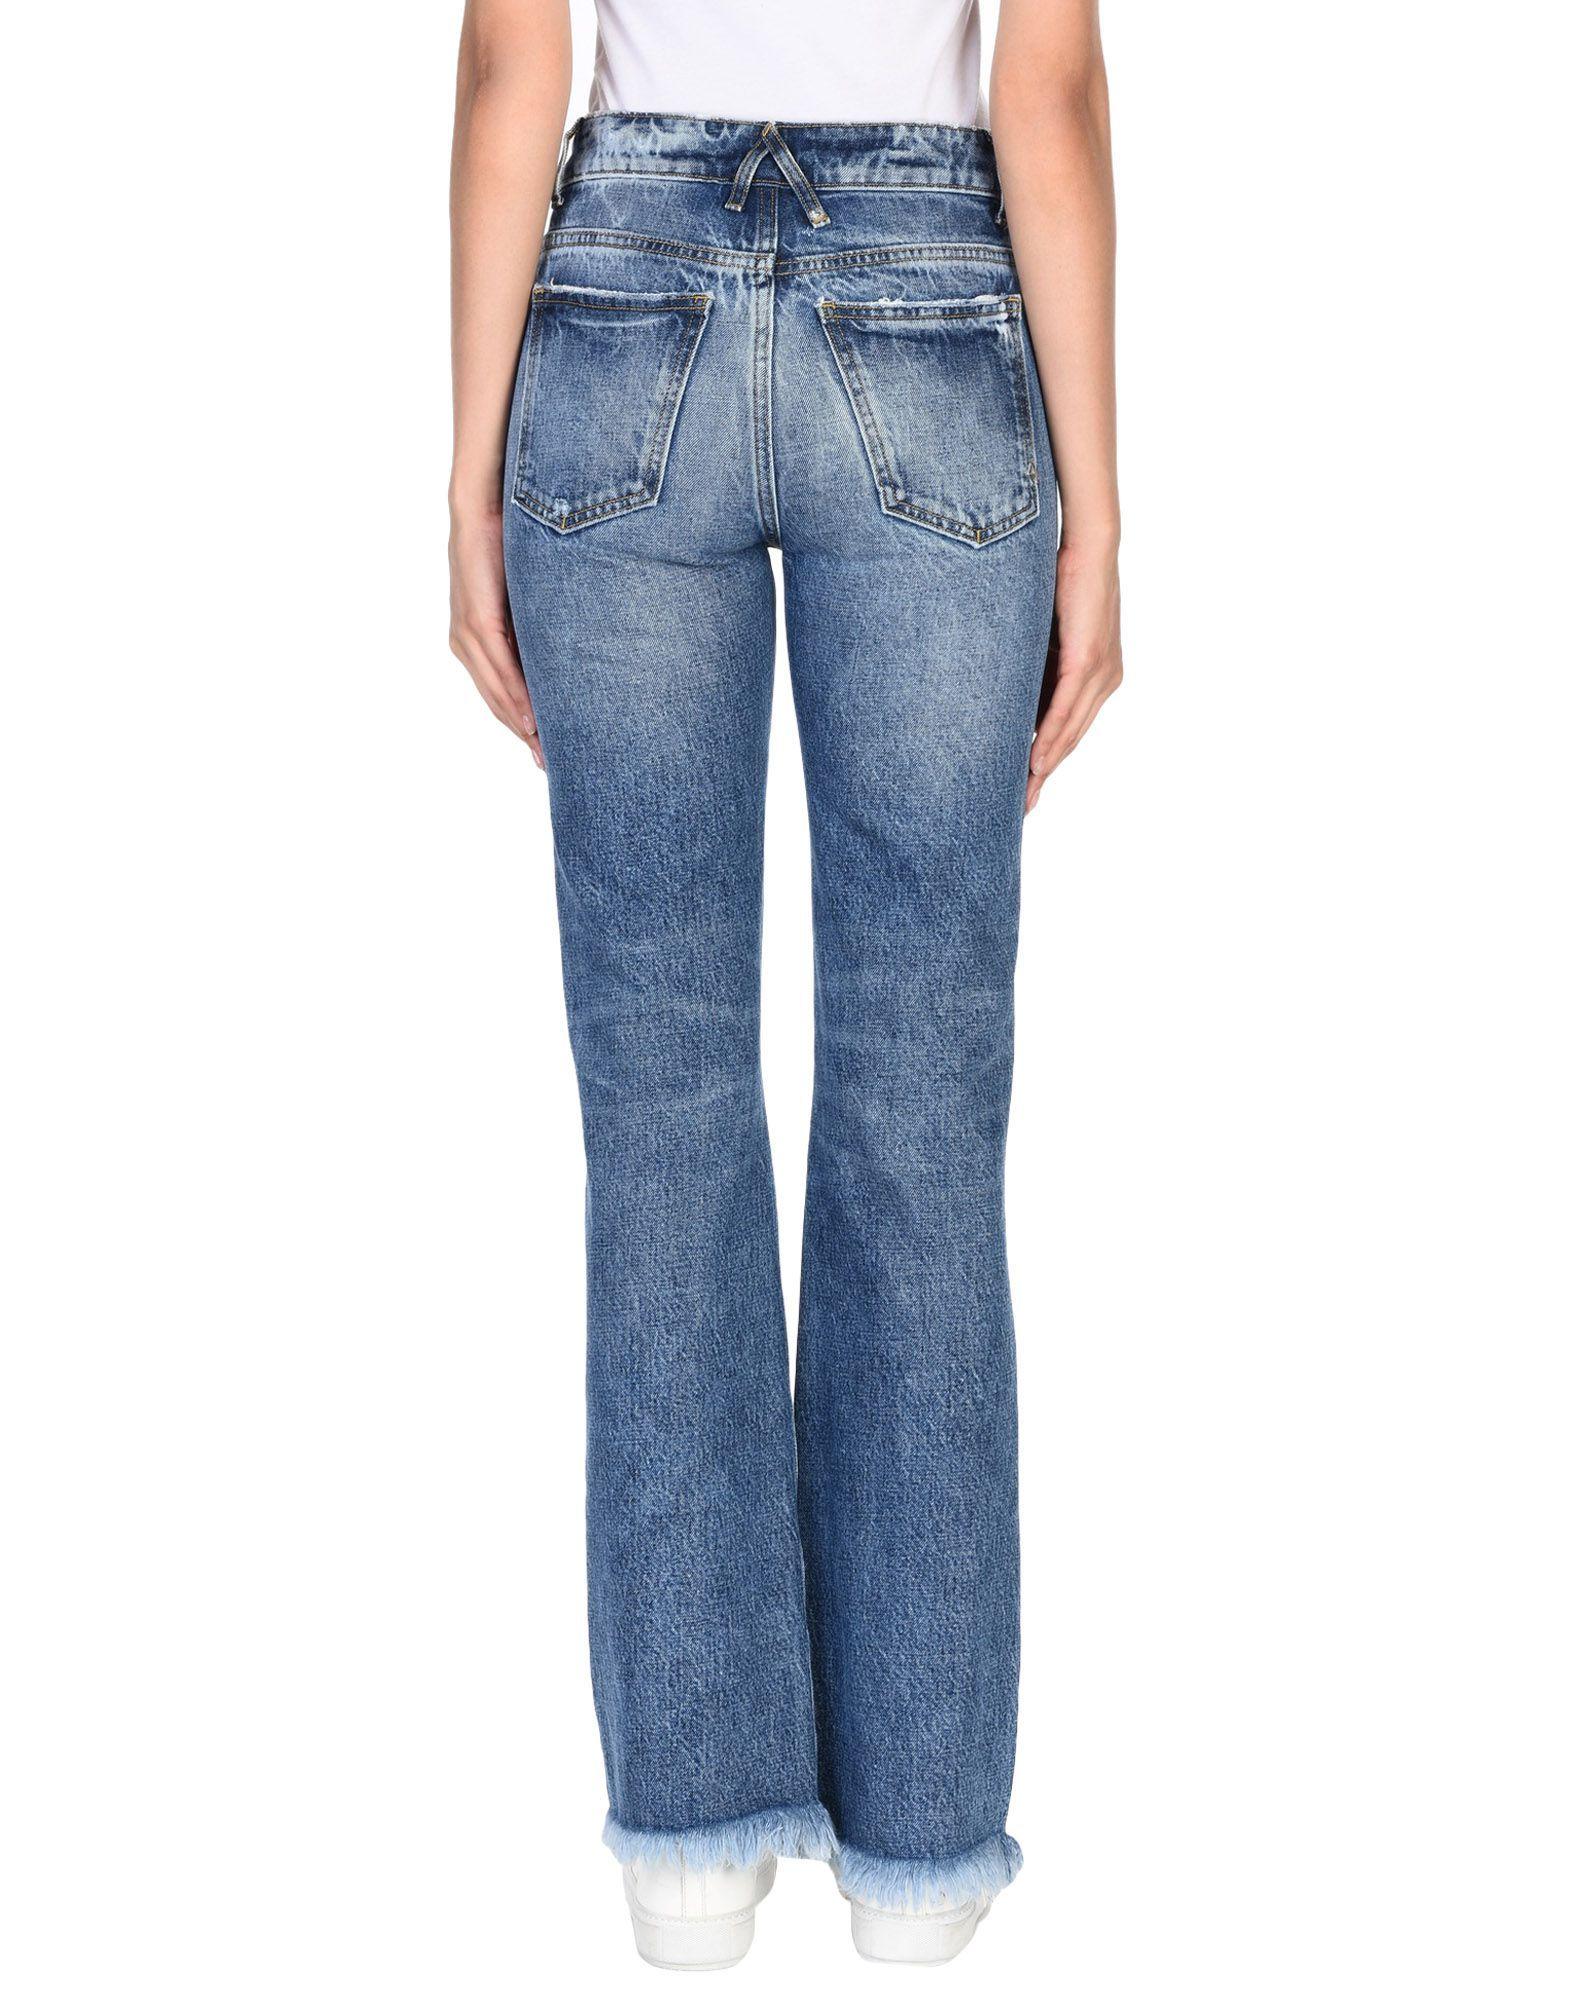 Cycle Blue Cotton Medium Wash Jeans